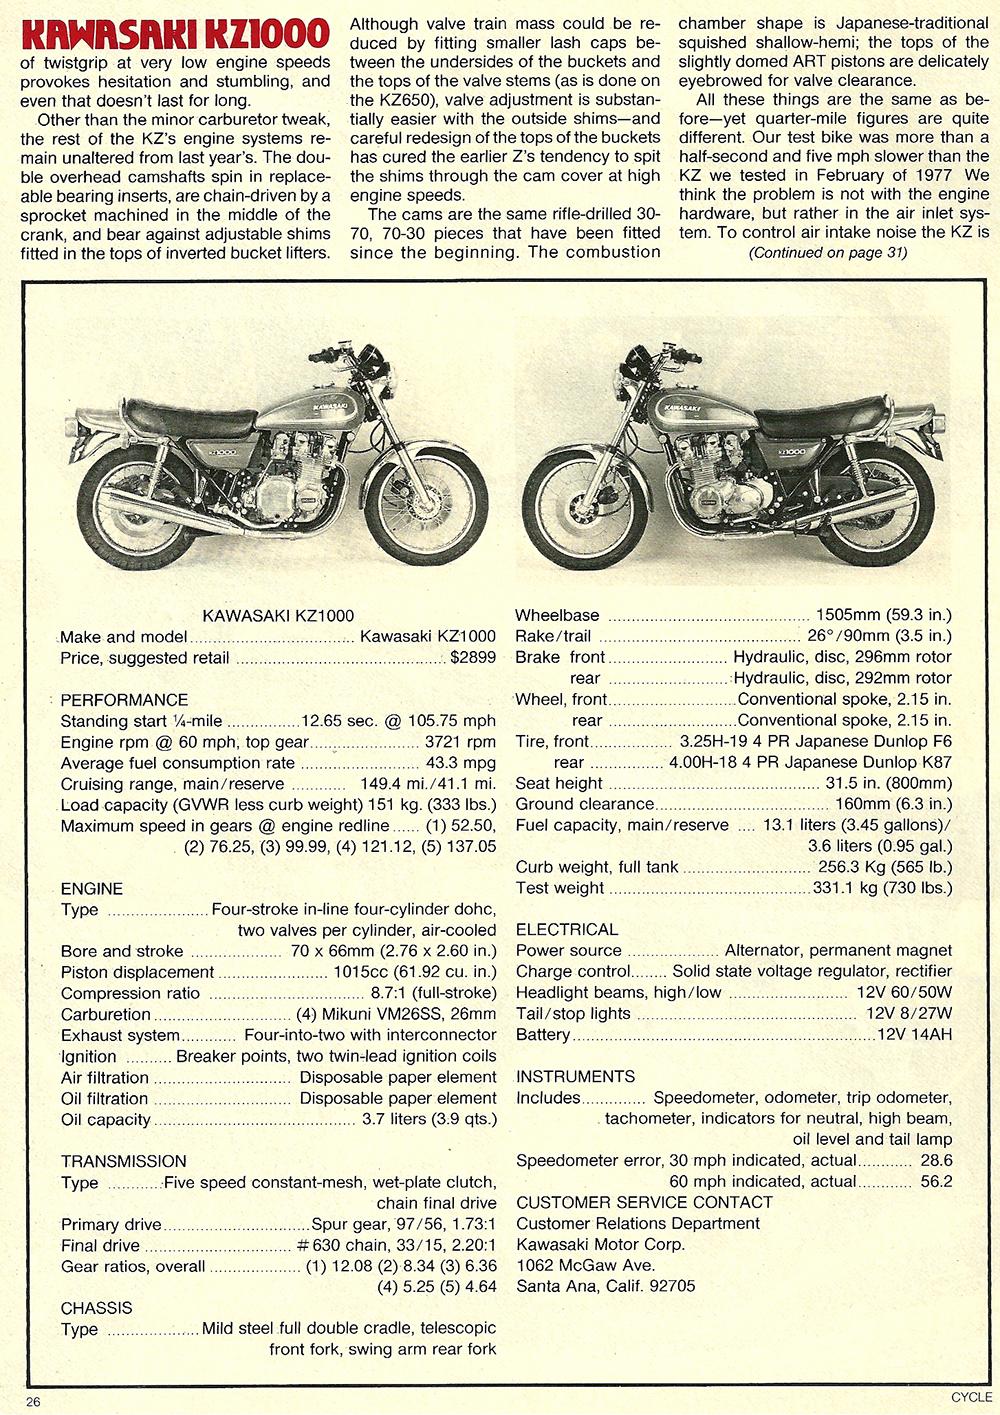 1978 Kawasaki KZ1000 road test 05.jpg